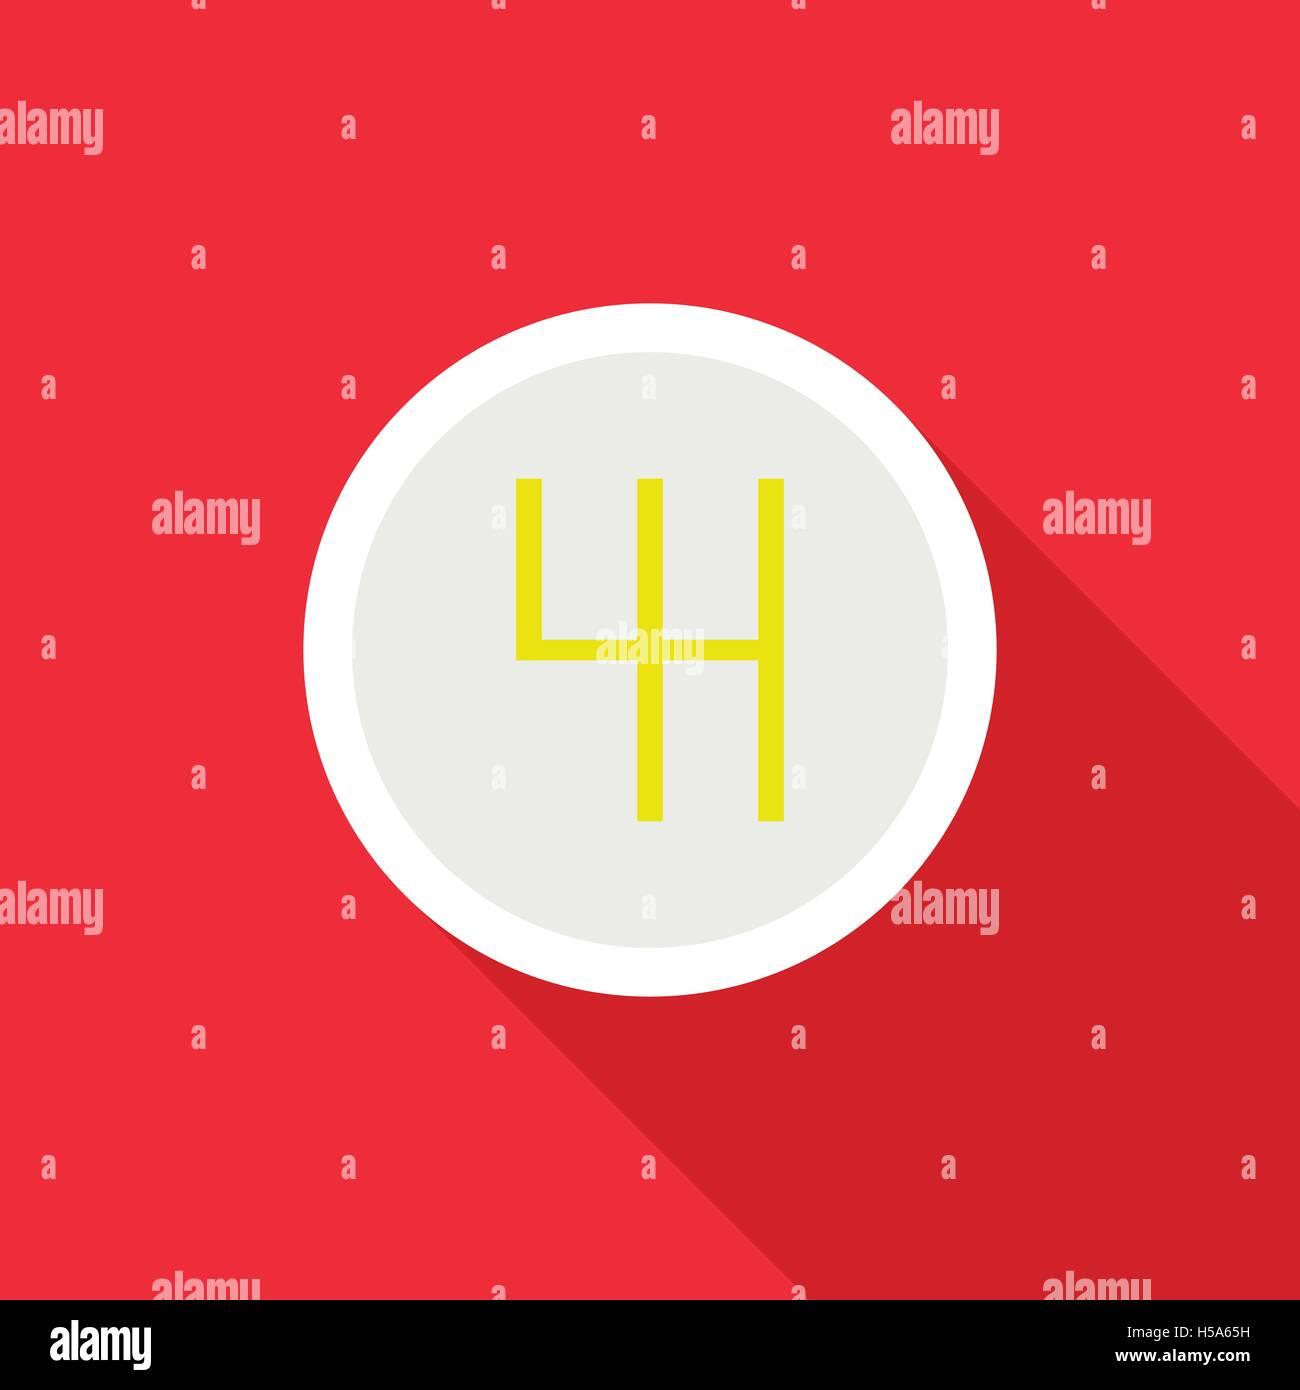 Gearbox schematics icon, flat style - Stock Image